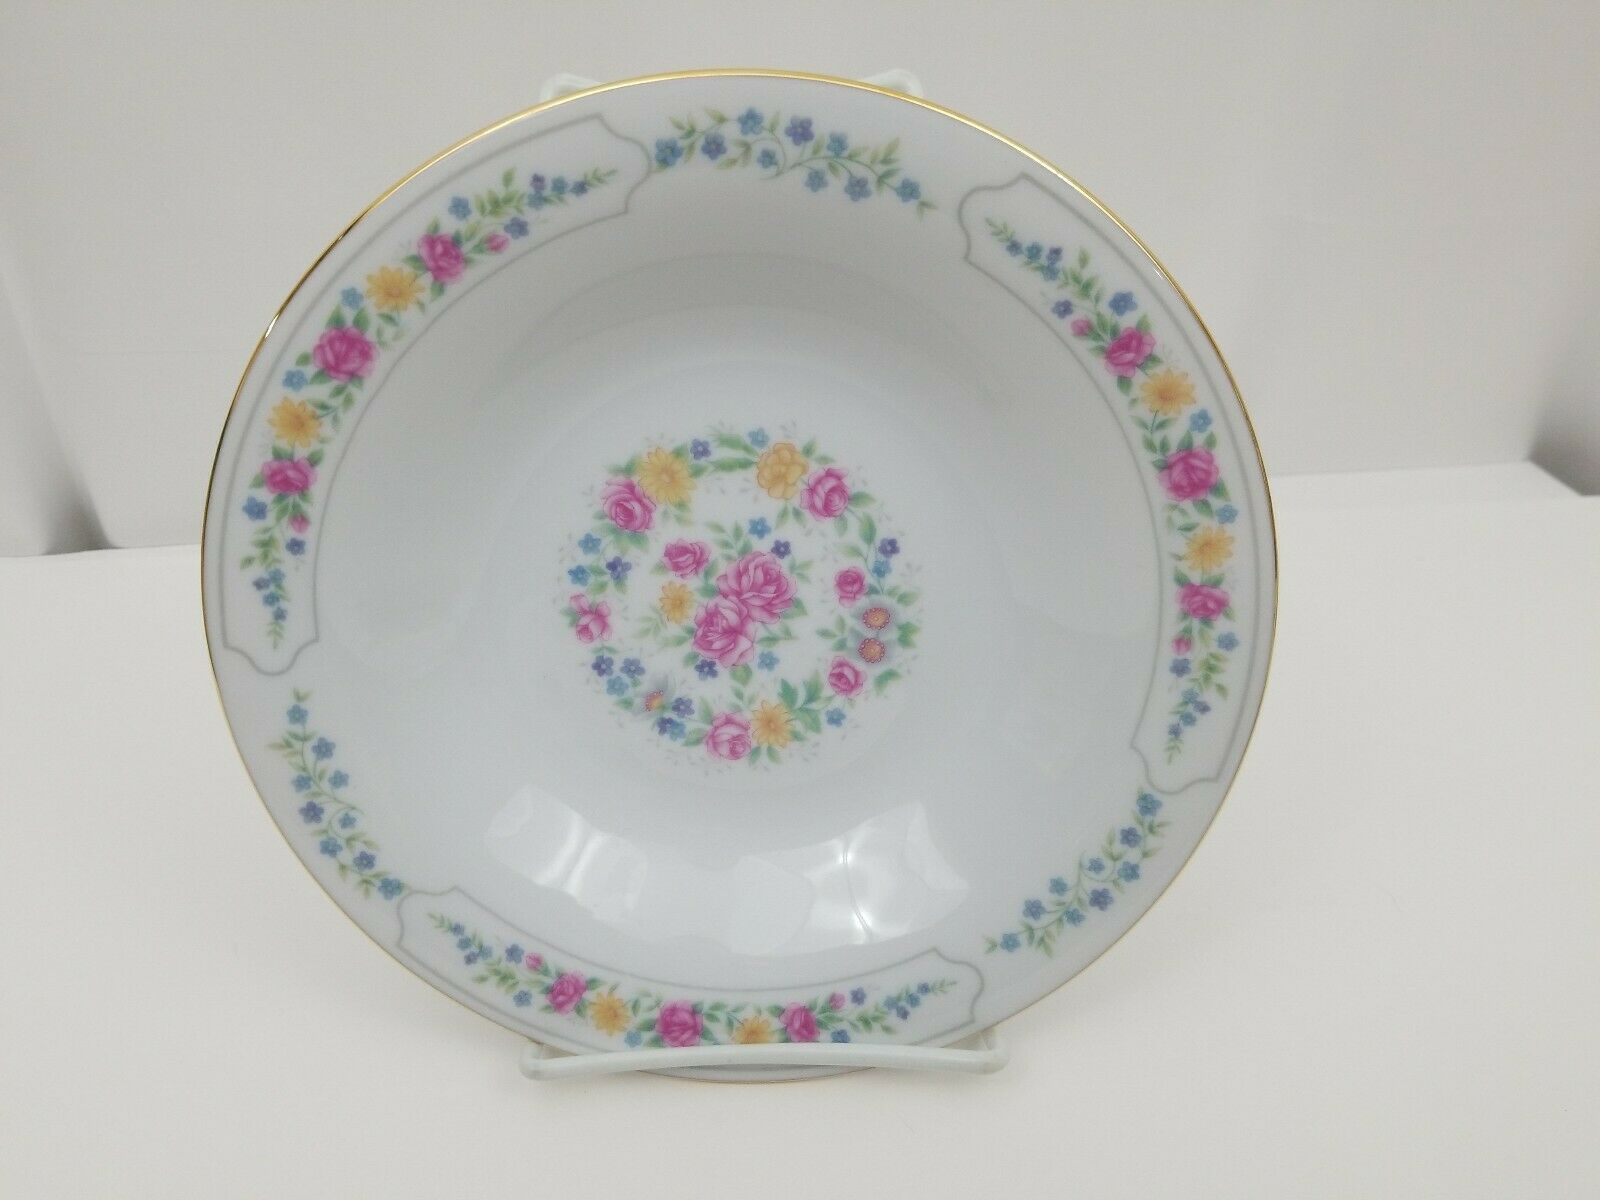 Liling Fine China Cereal Soup Bowls Set of 4 Yung Shen White Roses Keepsake 8.25 image 2